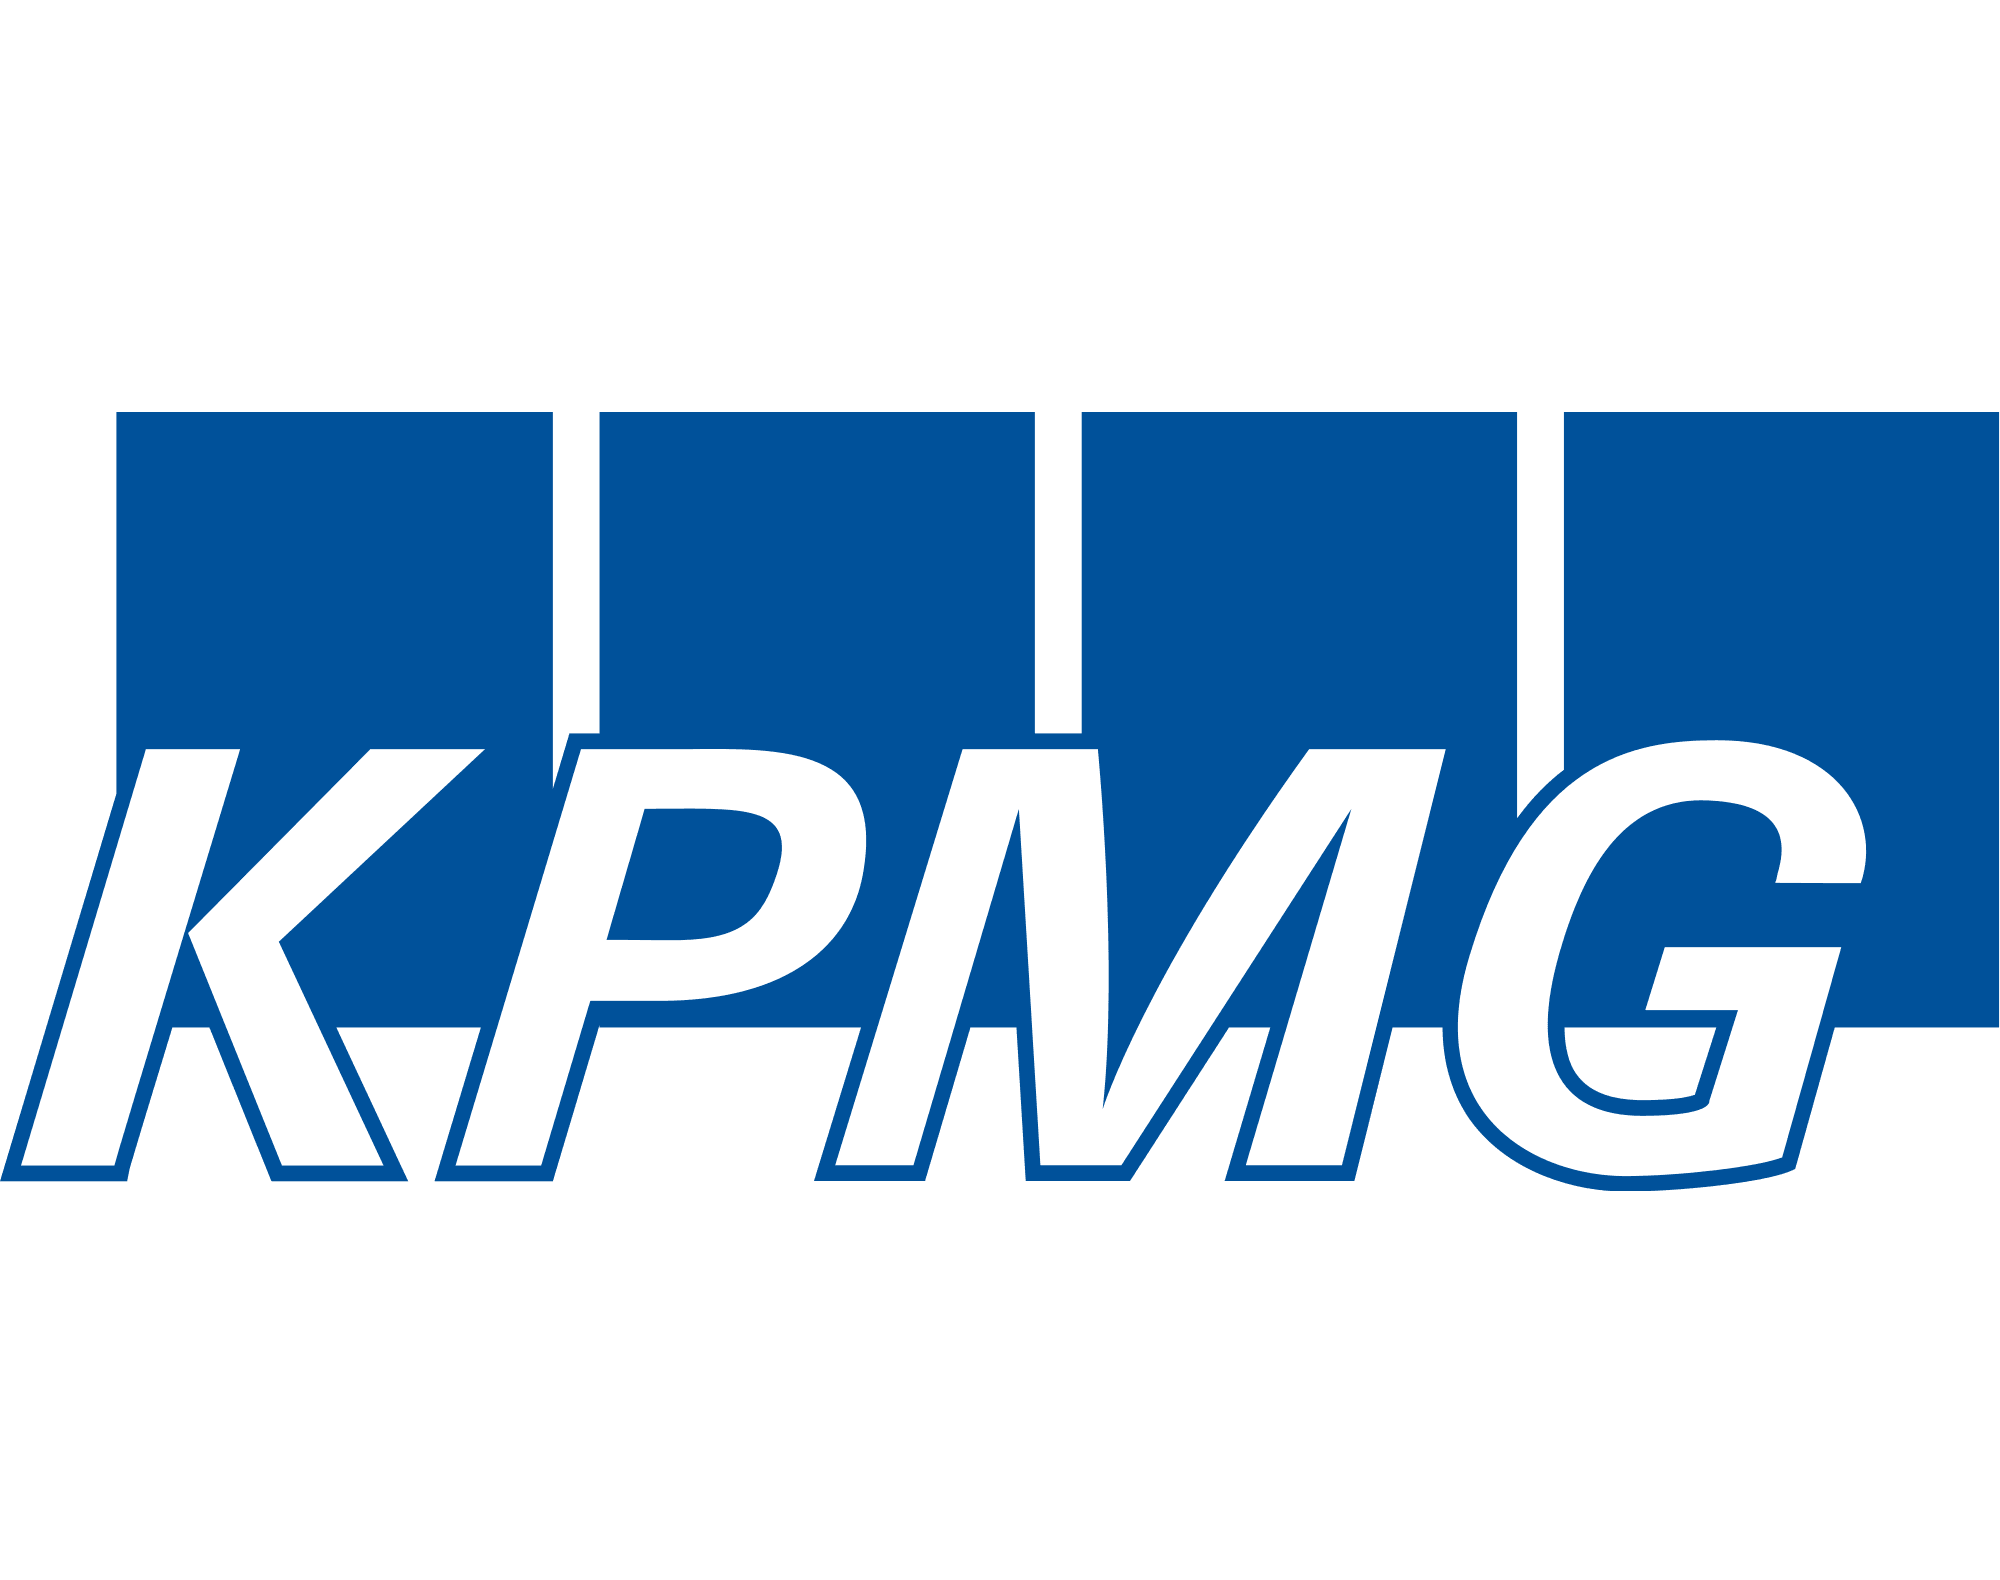 KPMG_TAGLIATO